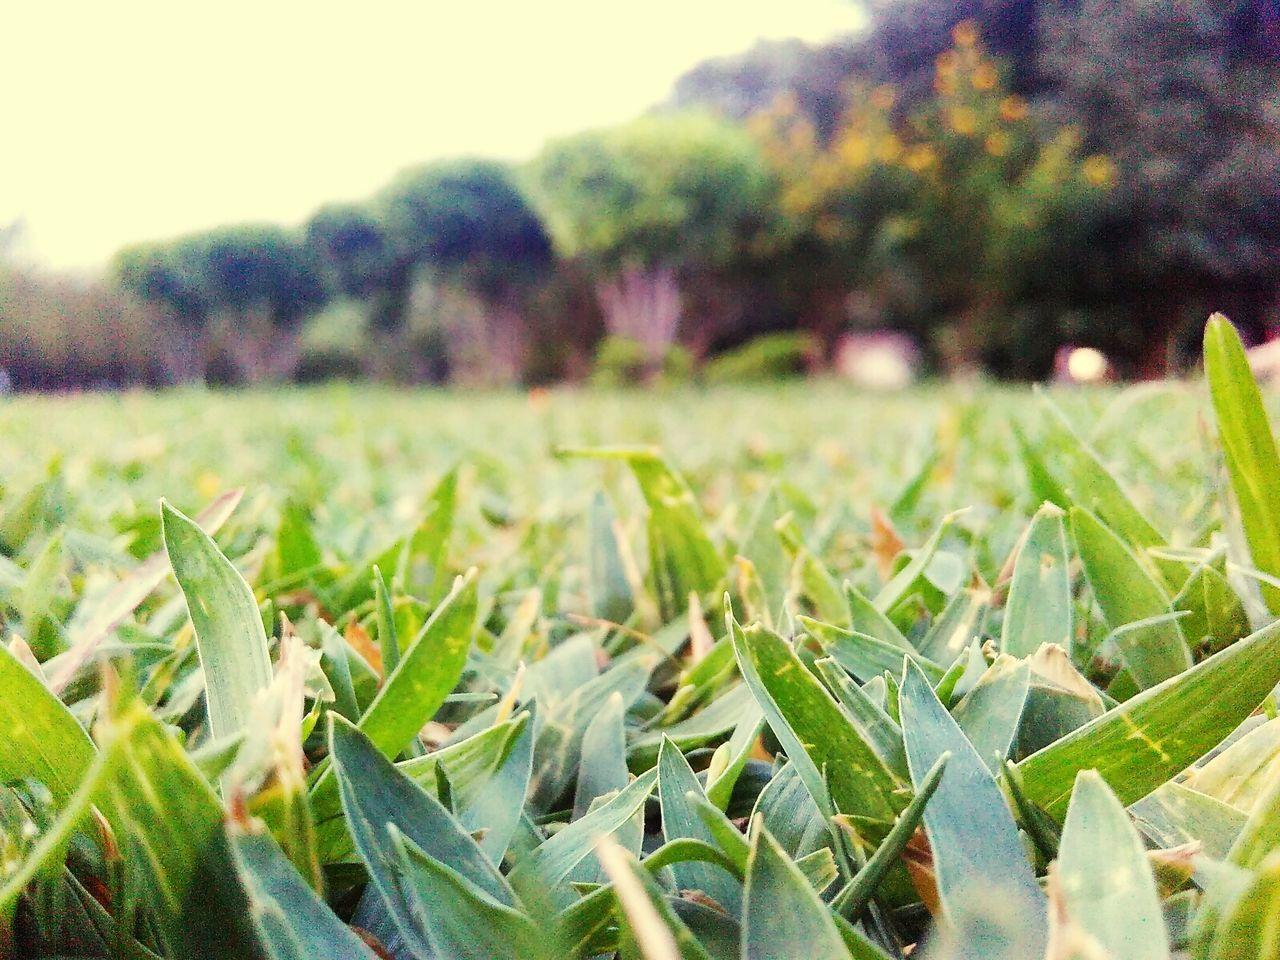 Green Nature Greenphotos Greenlove Beautygreen Garden Photography